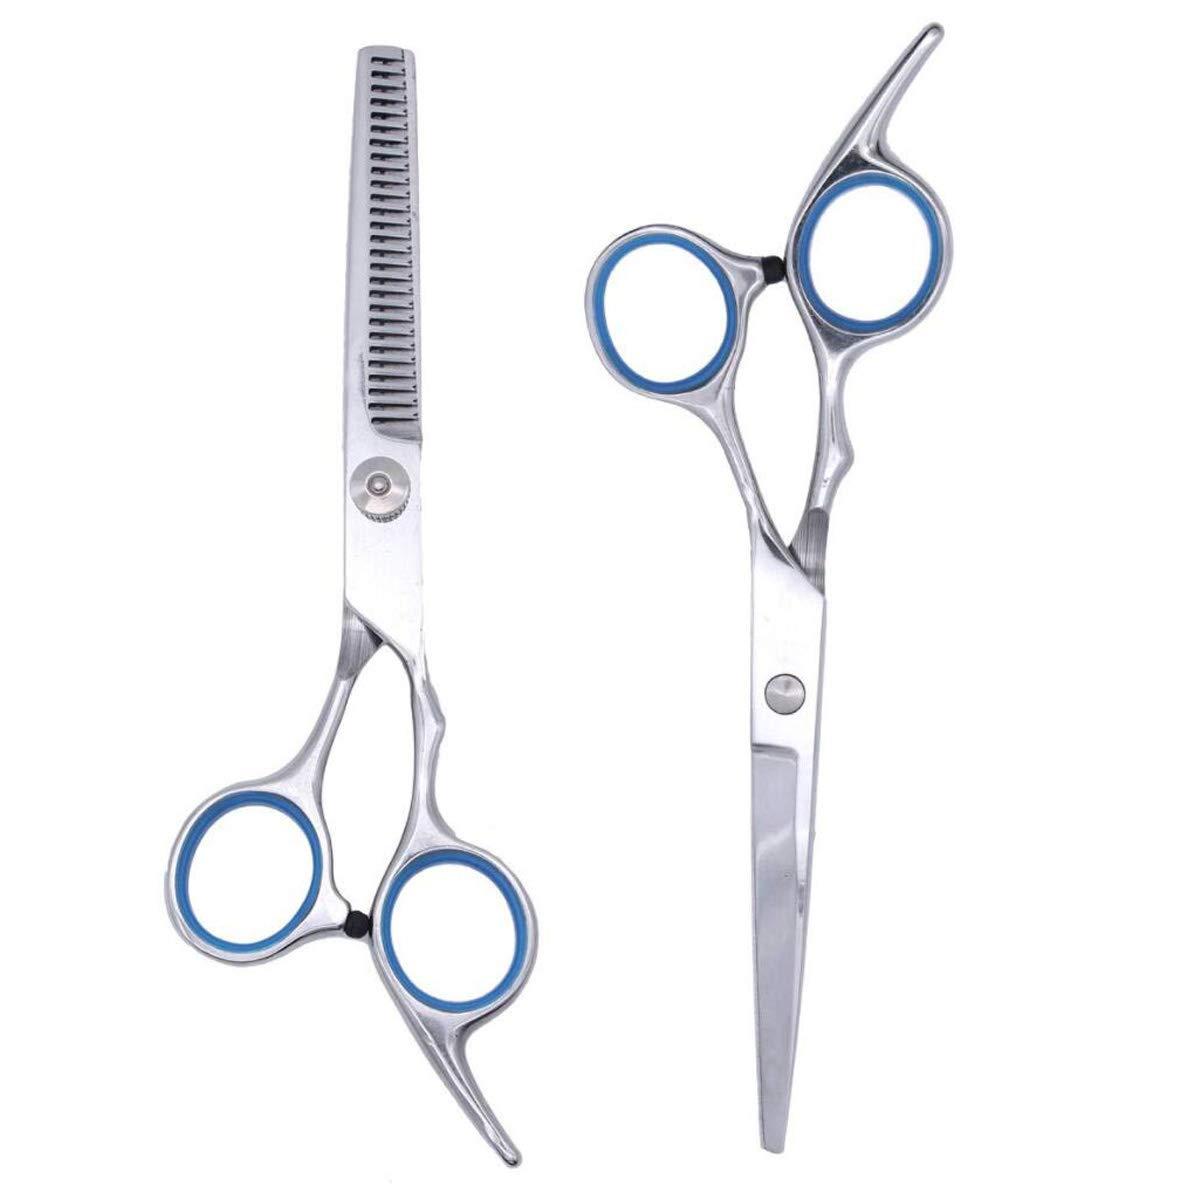 Hair Cutting Scissors Set, Professional Barber Thinning Haircut Scissors Kit Stainless Steel Salon Razor Scissor